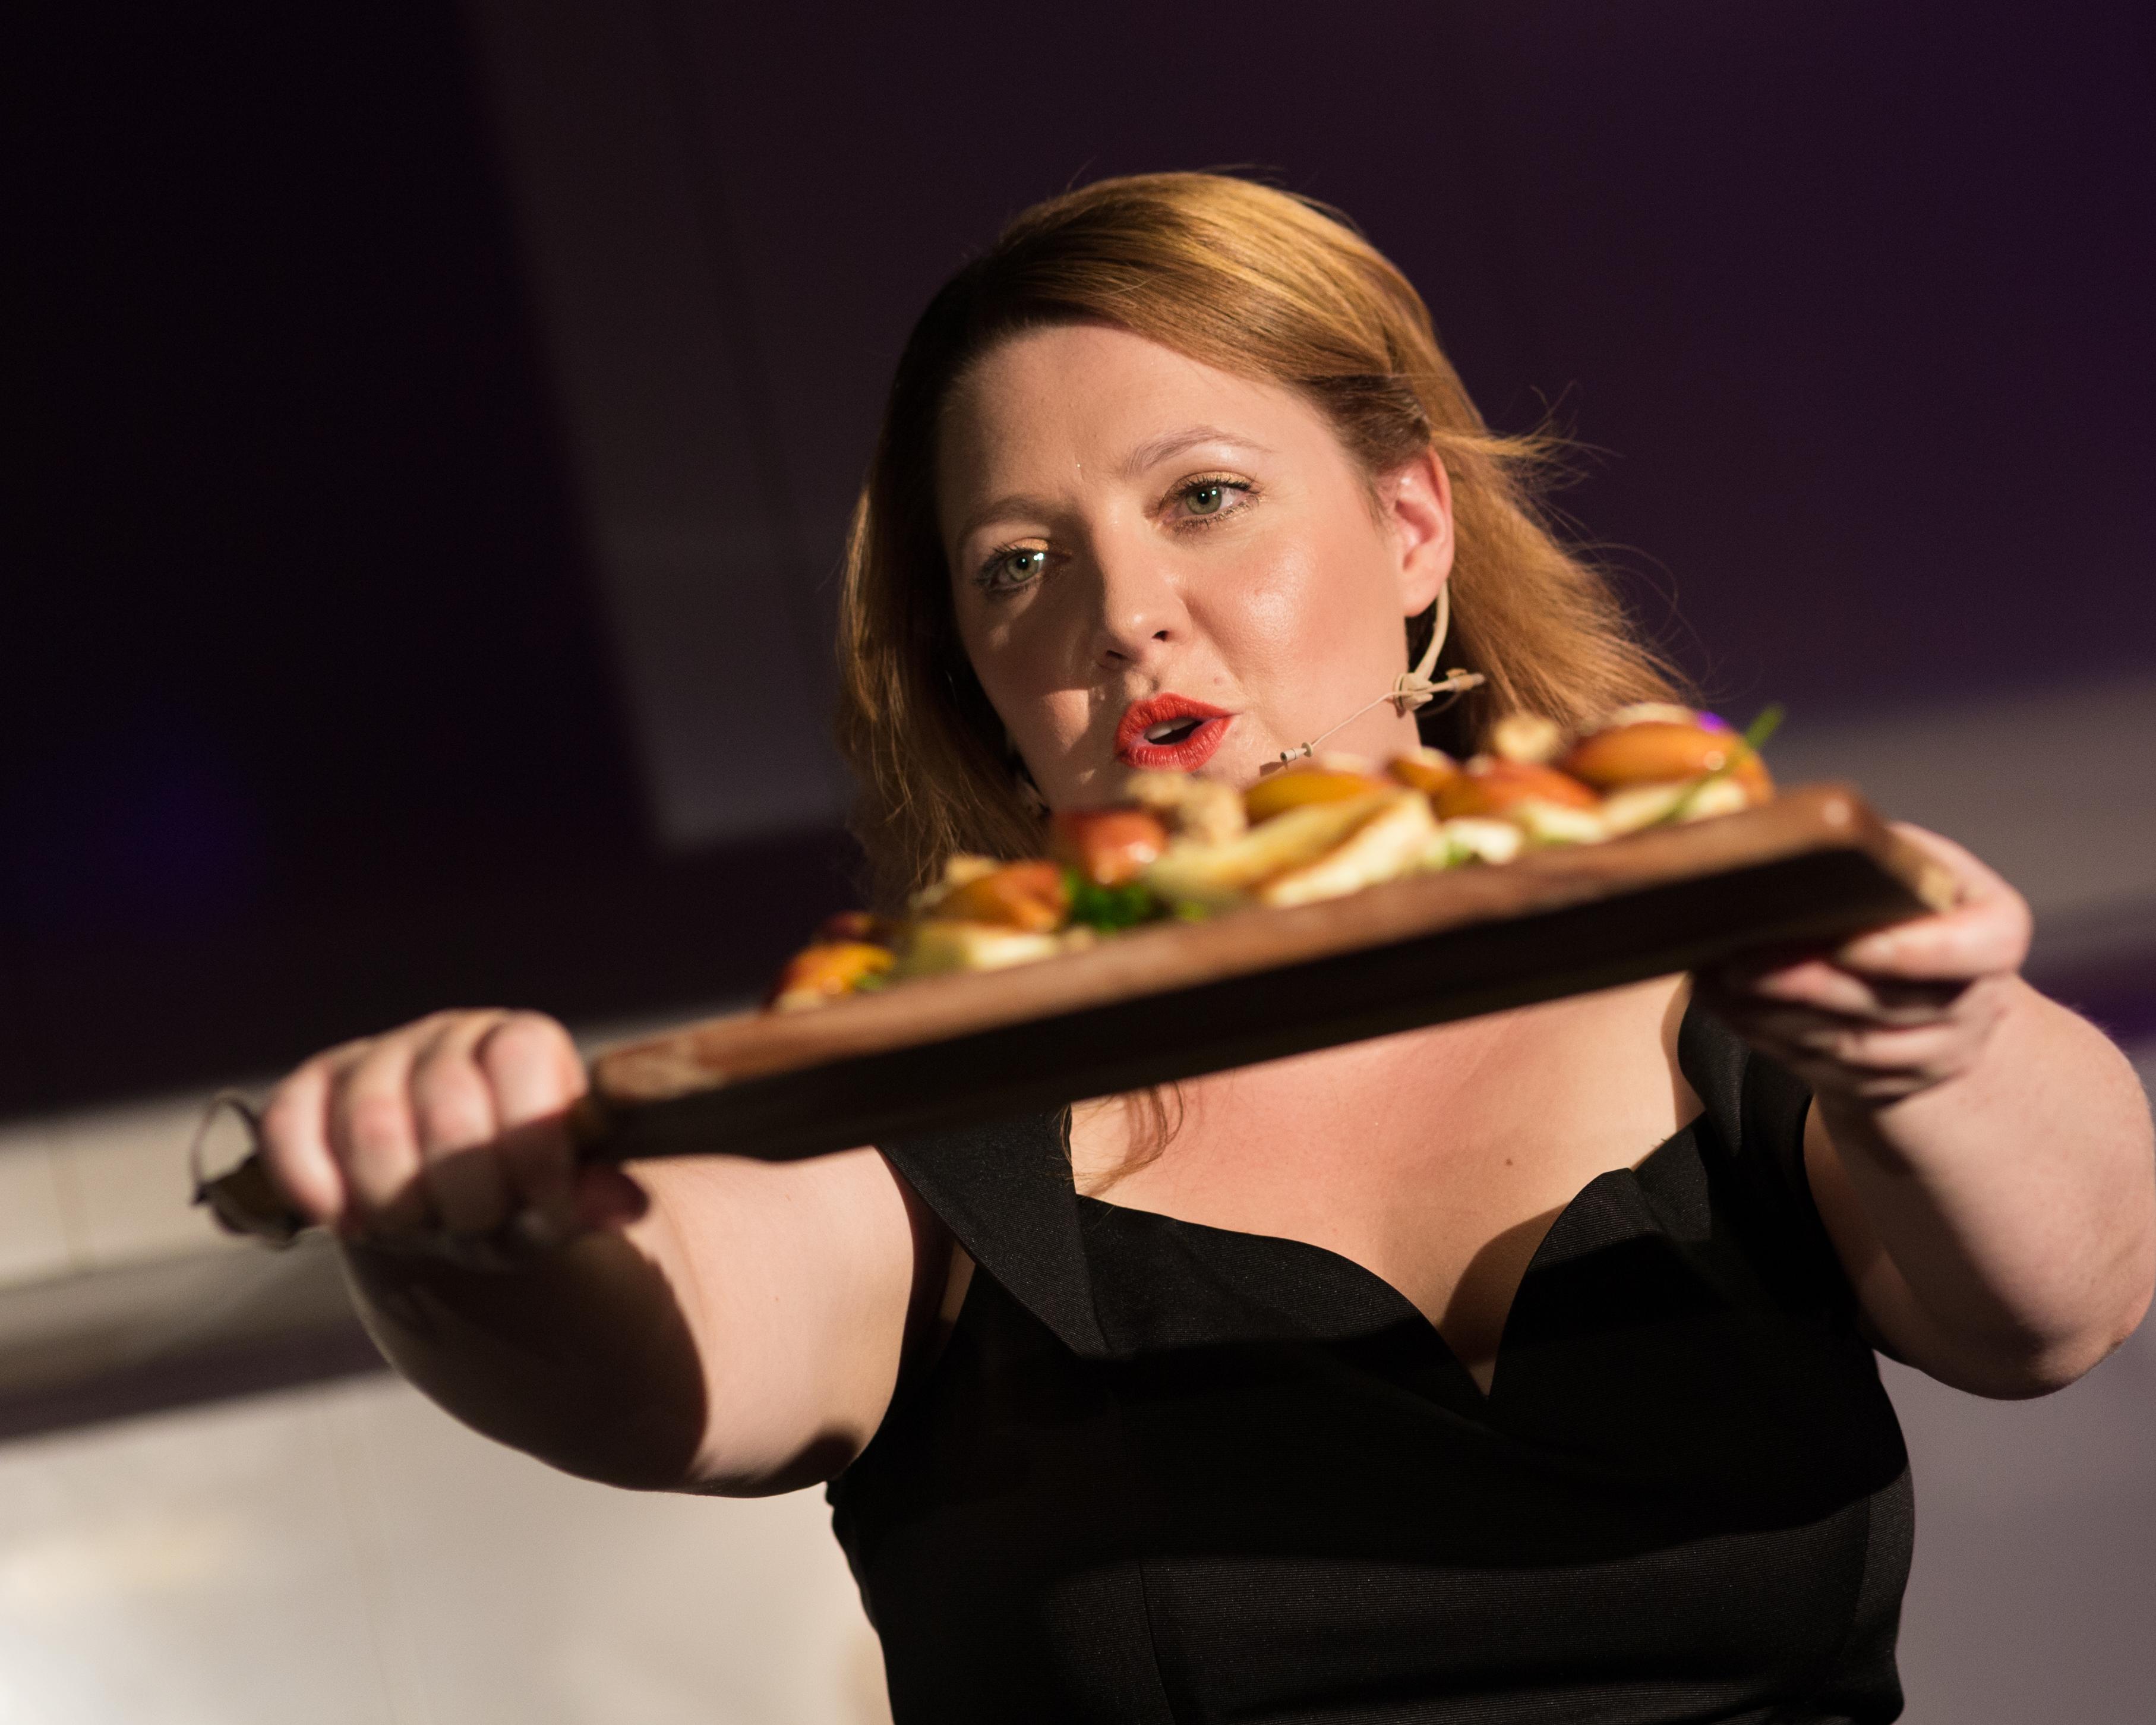 BWW Review: MICHELLE PEARSON'S COMFORT FOOD CABARET at Melbourne Fringe